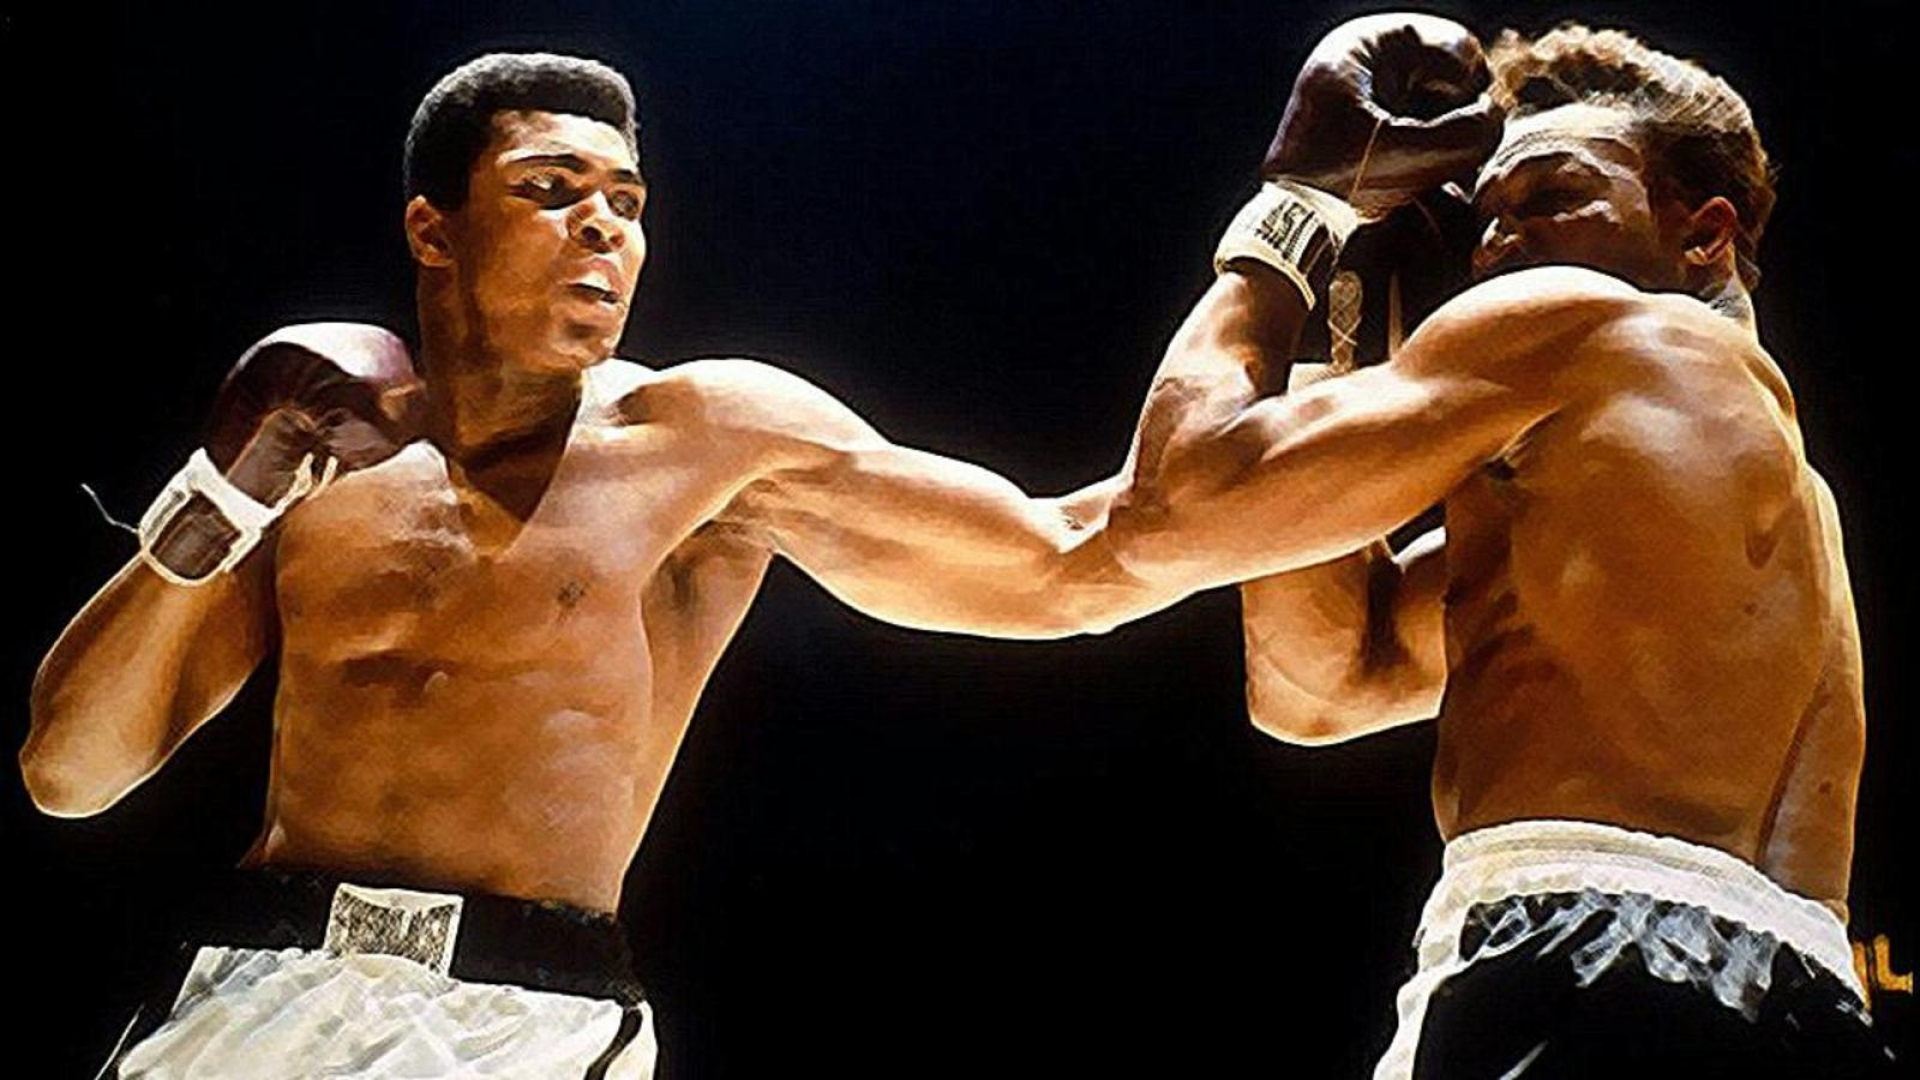 Muhammad Ali Wallpaper Hd Iphone Muhammad Ali Hd Backgrounds Pixelstalk Net